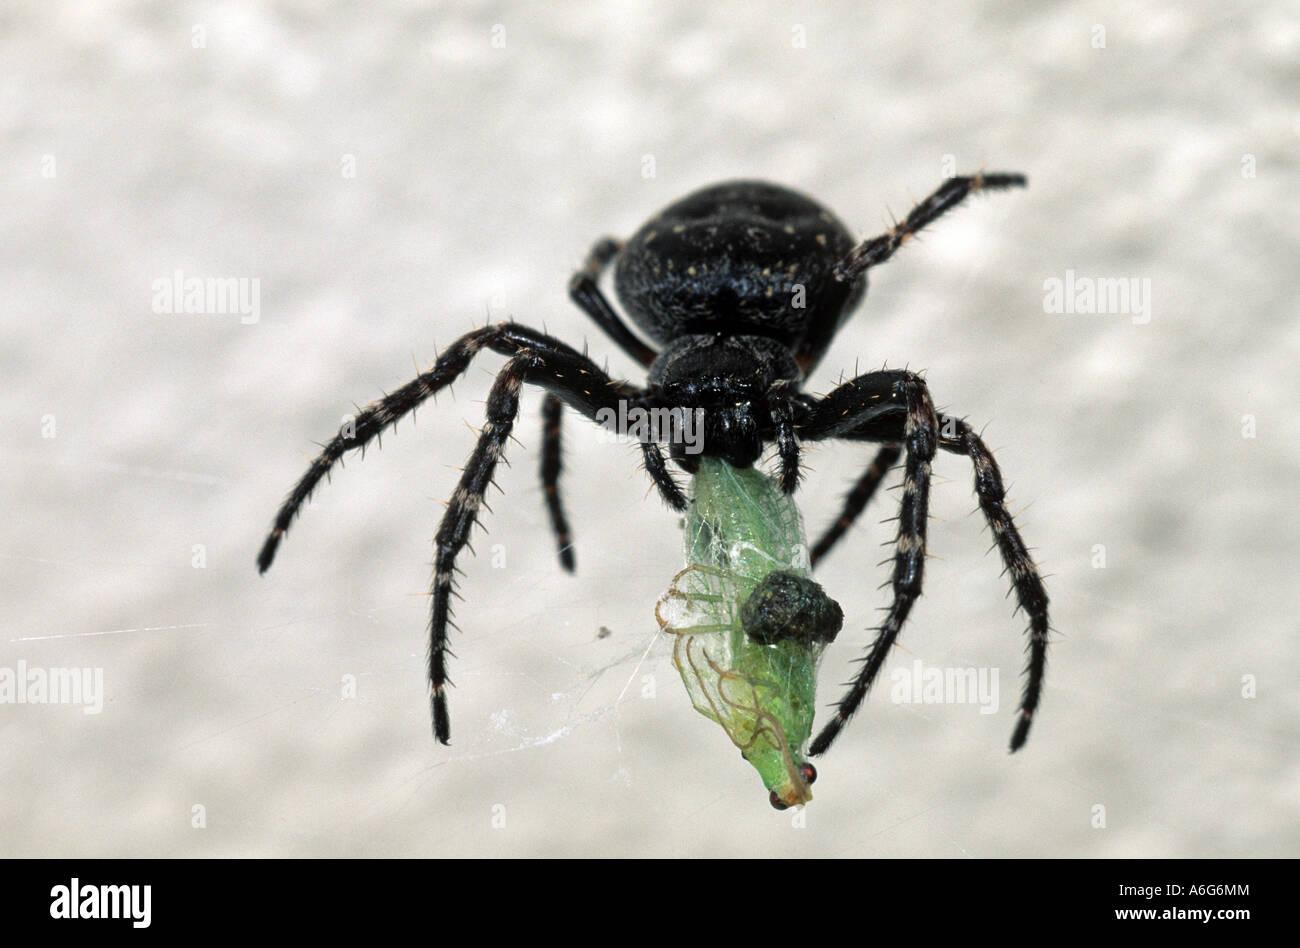 Walnut Orb-Weaver Spider (Nuctenea umbratica) green lacewing - Stock Image